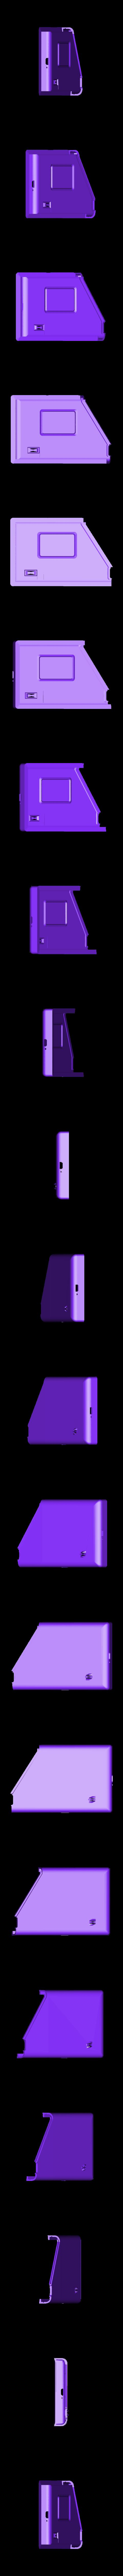 cova108_bottom.stl Download free STL file Fairphone 2 cover • 3D printer model, unwohlpol